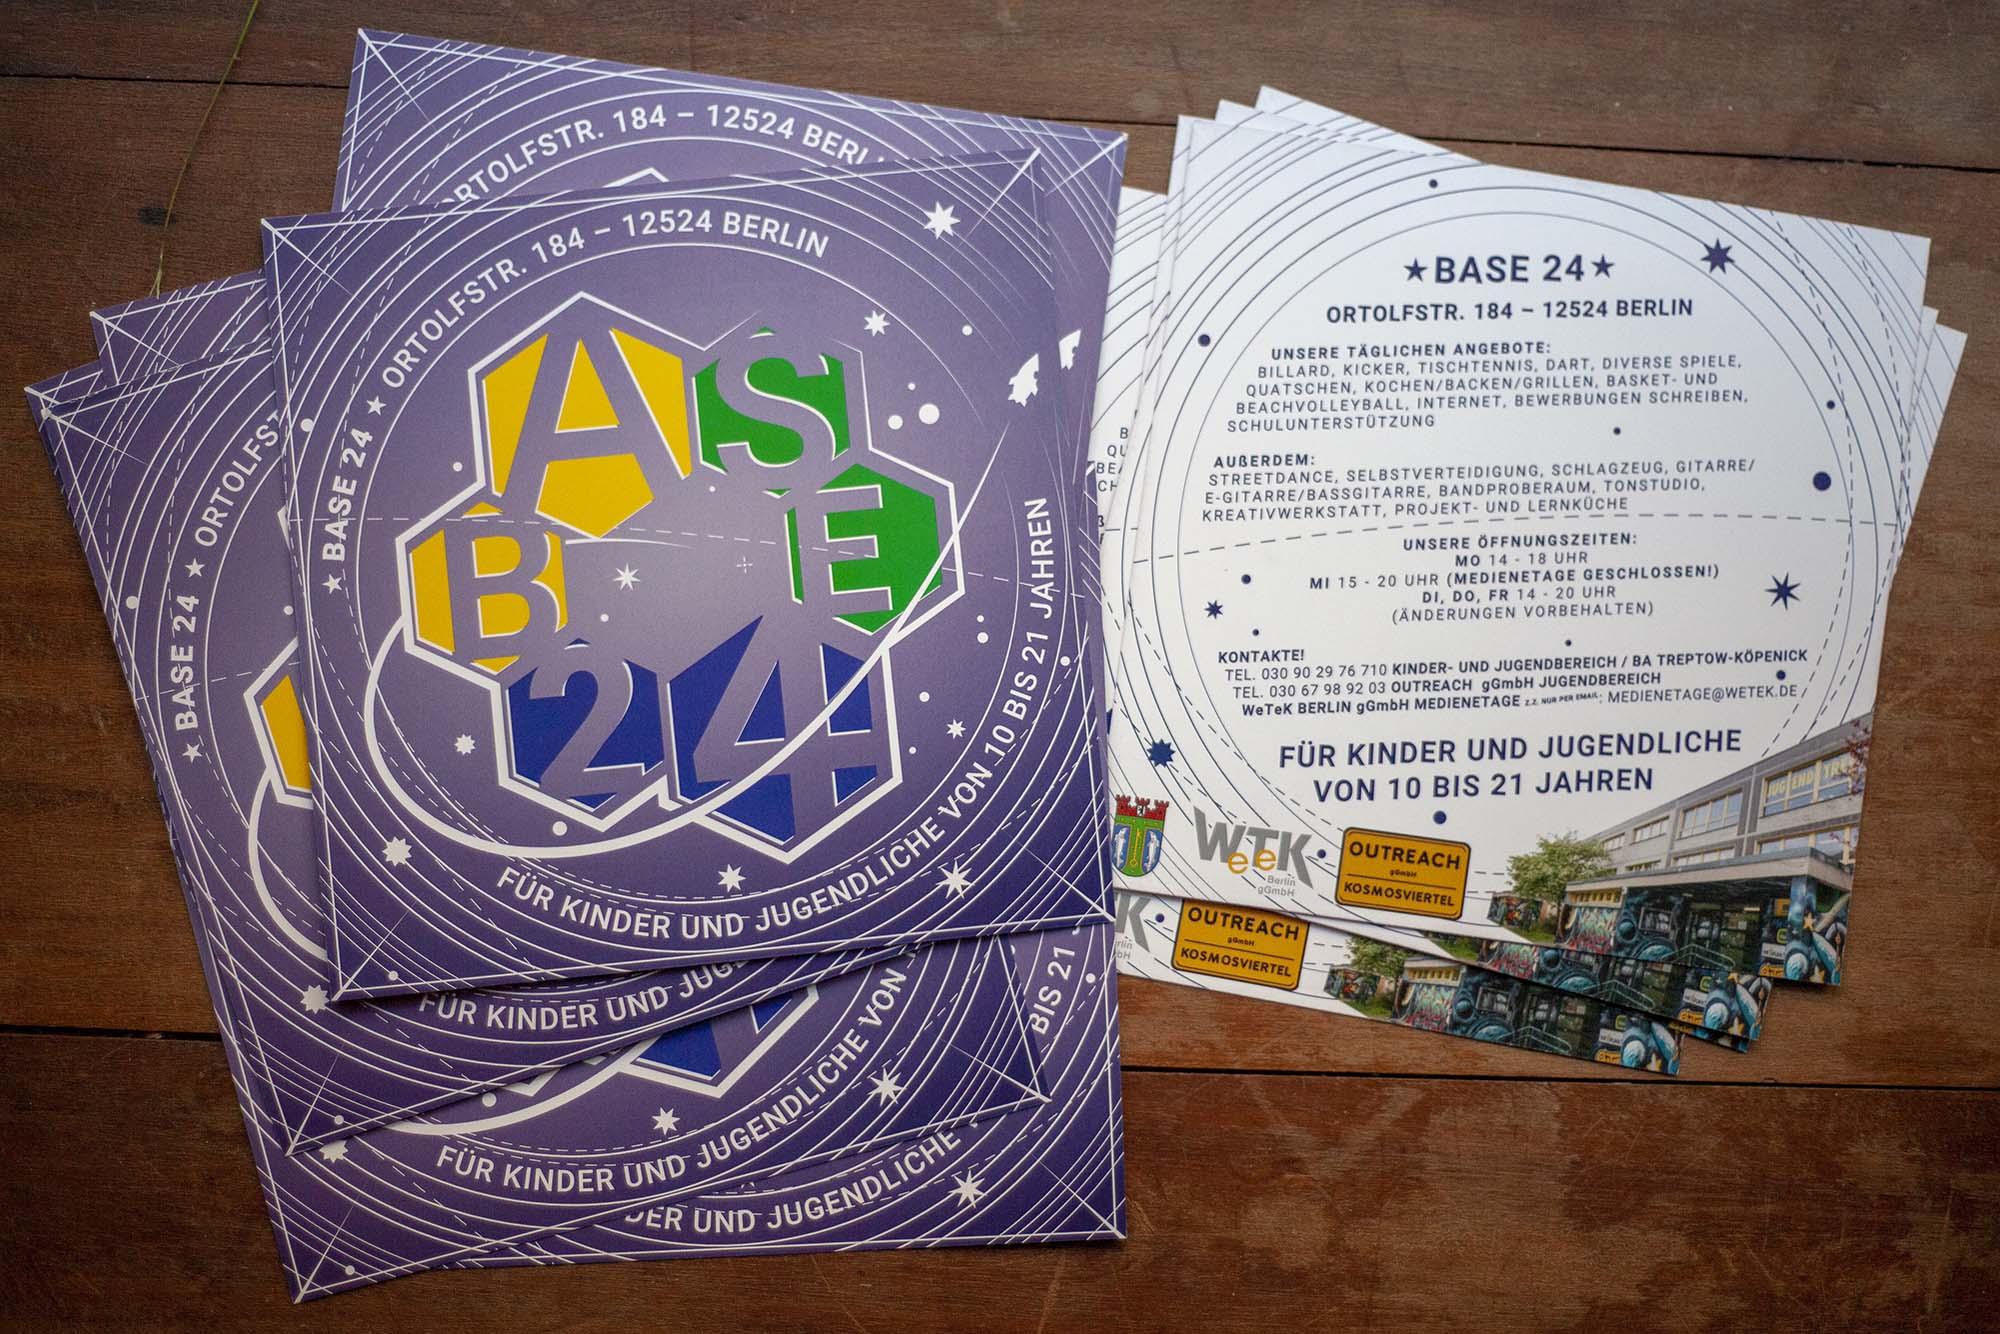 base24 flyer